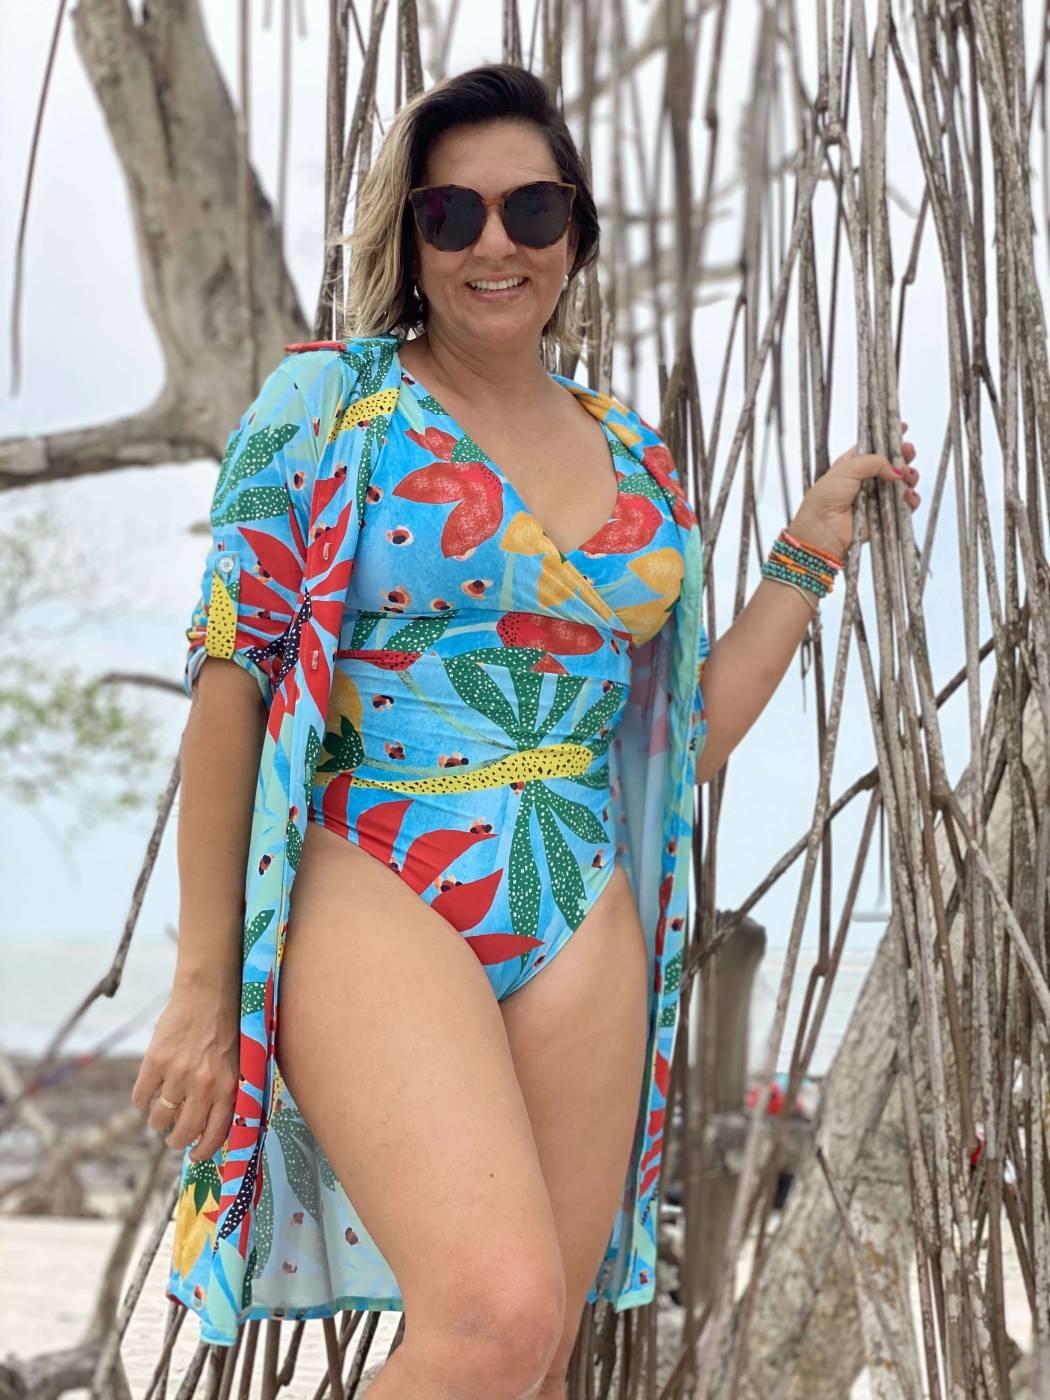 Compre o Look completo & economize : Maiô Premium Aruba + Saída de Praia Chemise uv50+ PRO